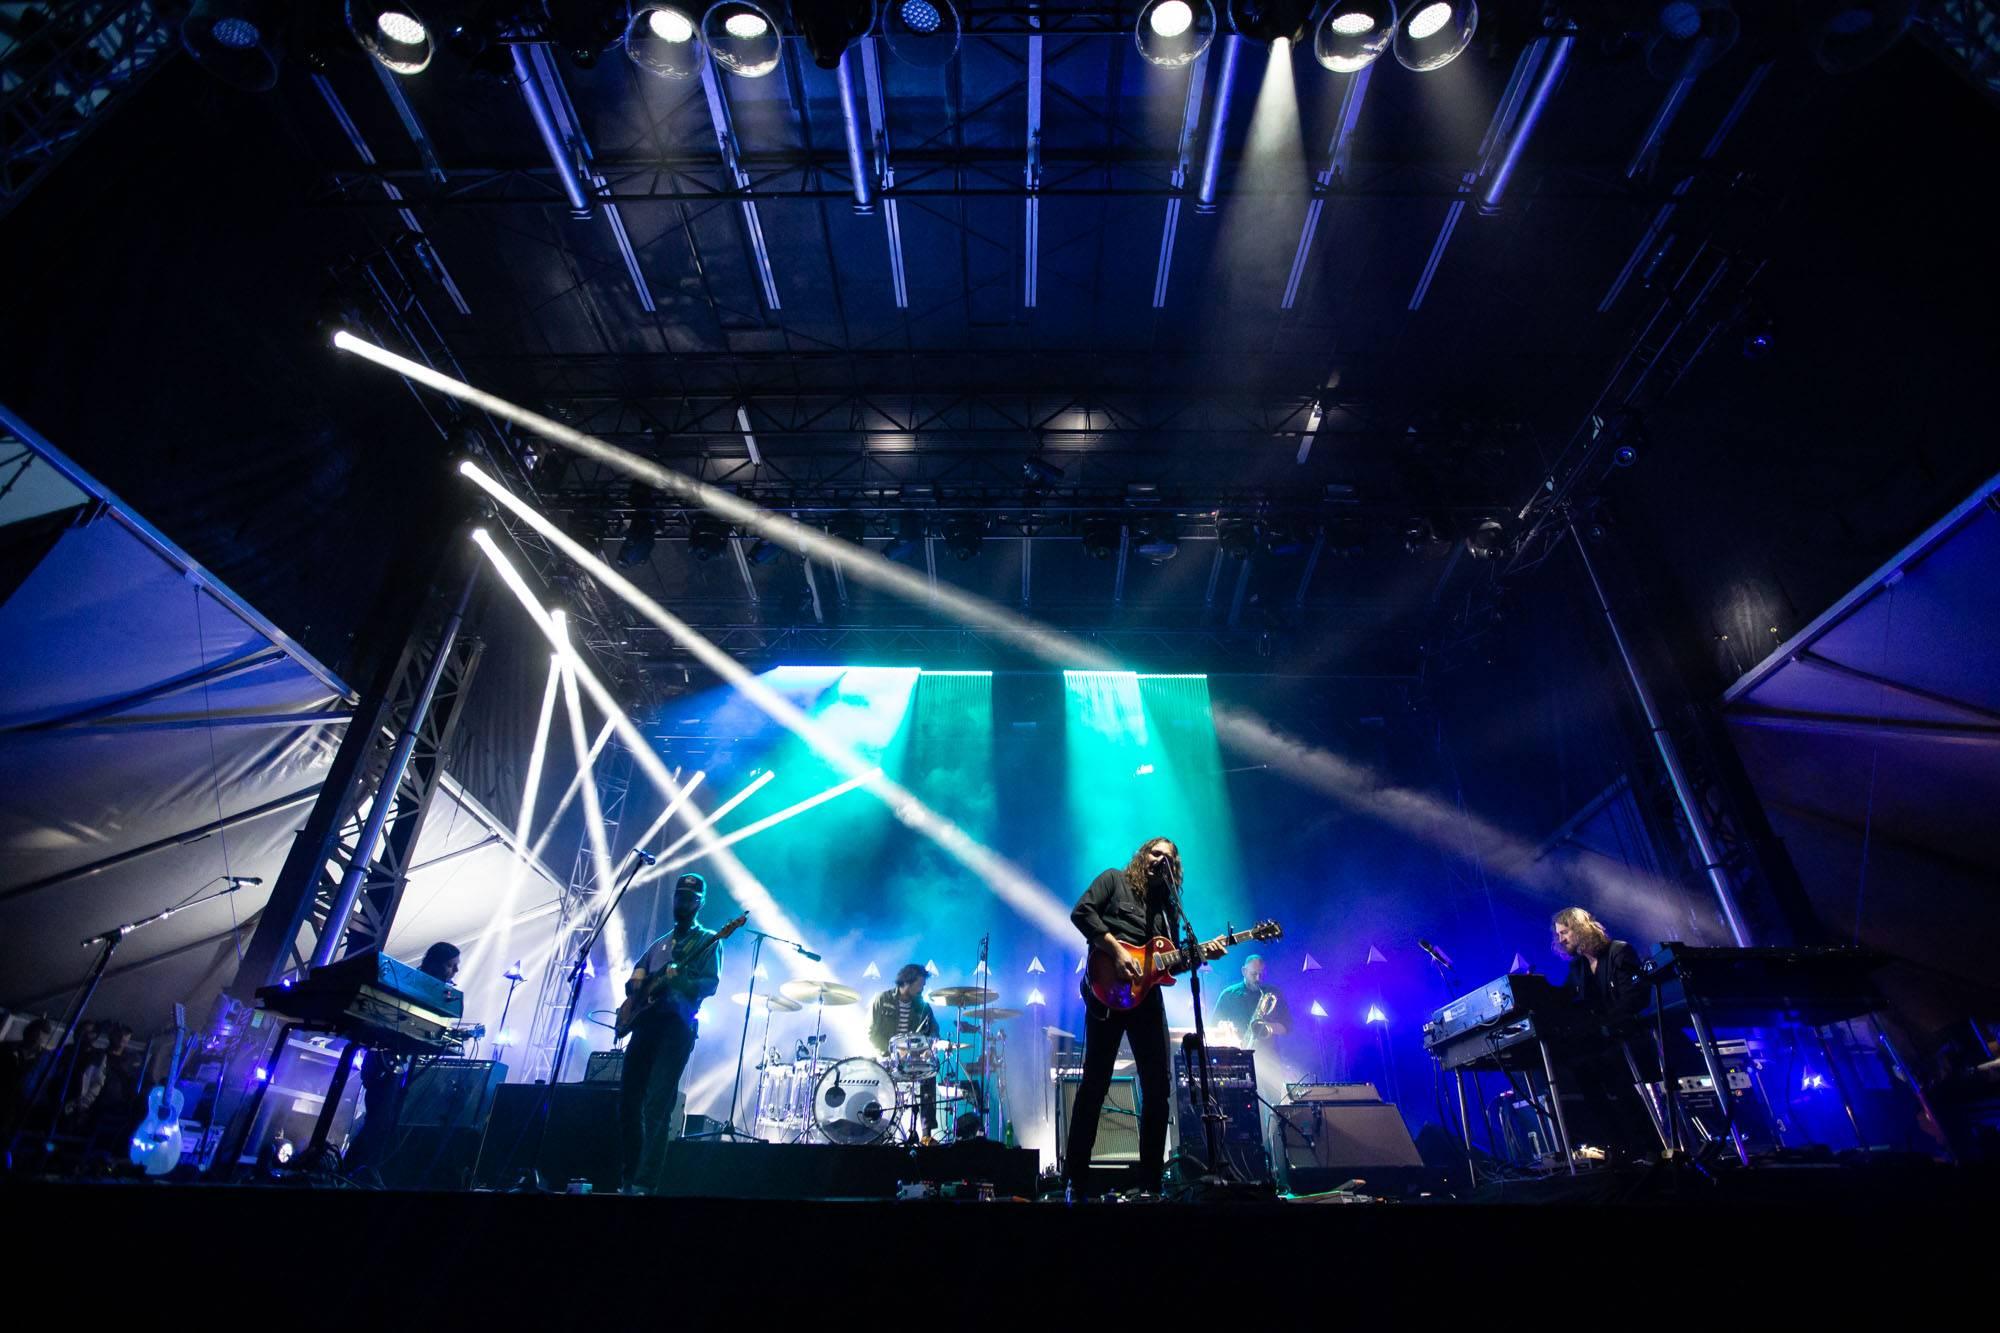 The War On Drugs at Skookum Festival, Vancouver, Sep 8 2018. Kirk Chantraine photo.